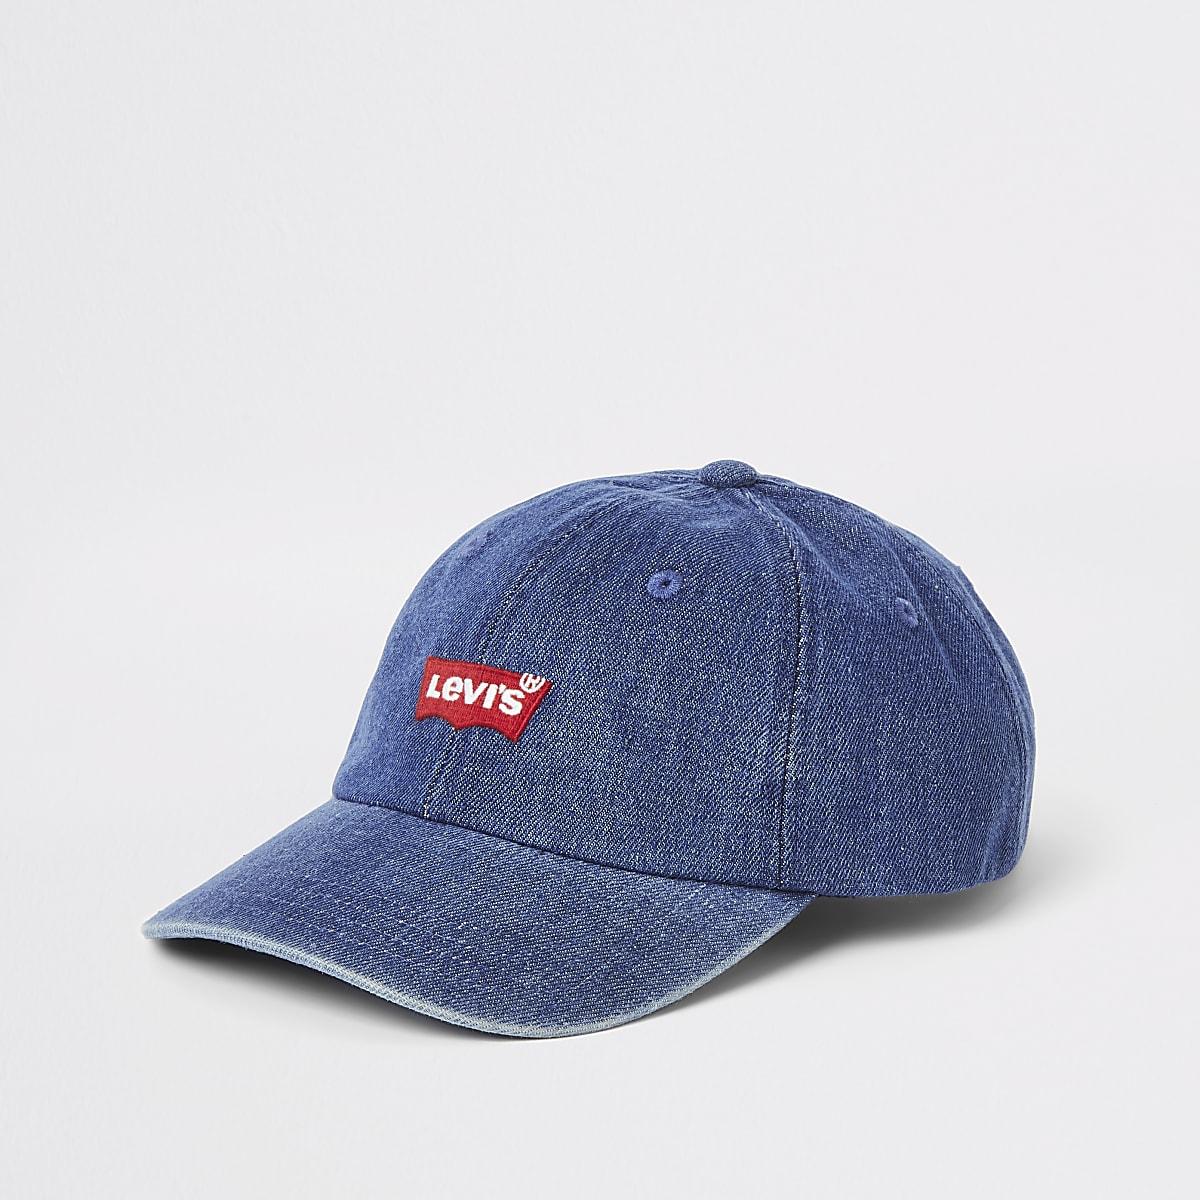 Levi's blue classic denim baseball cap